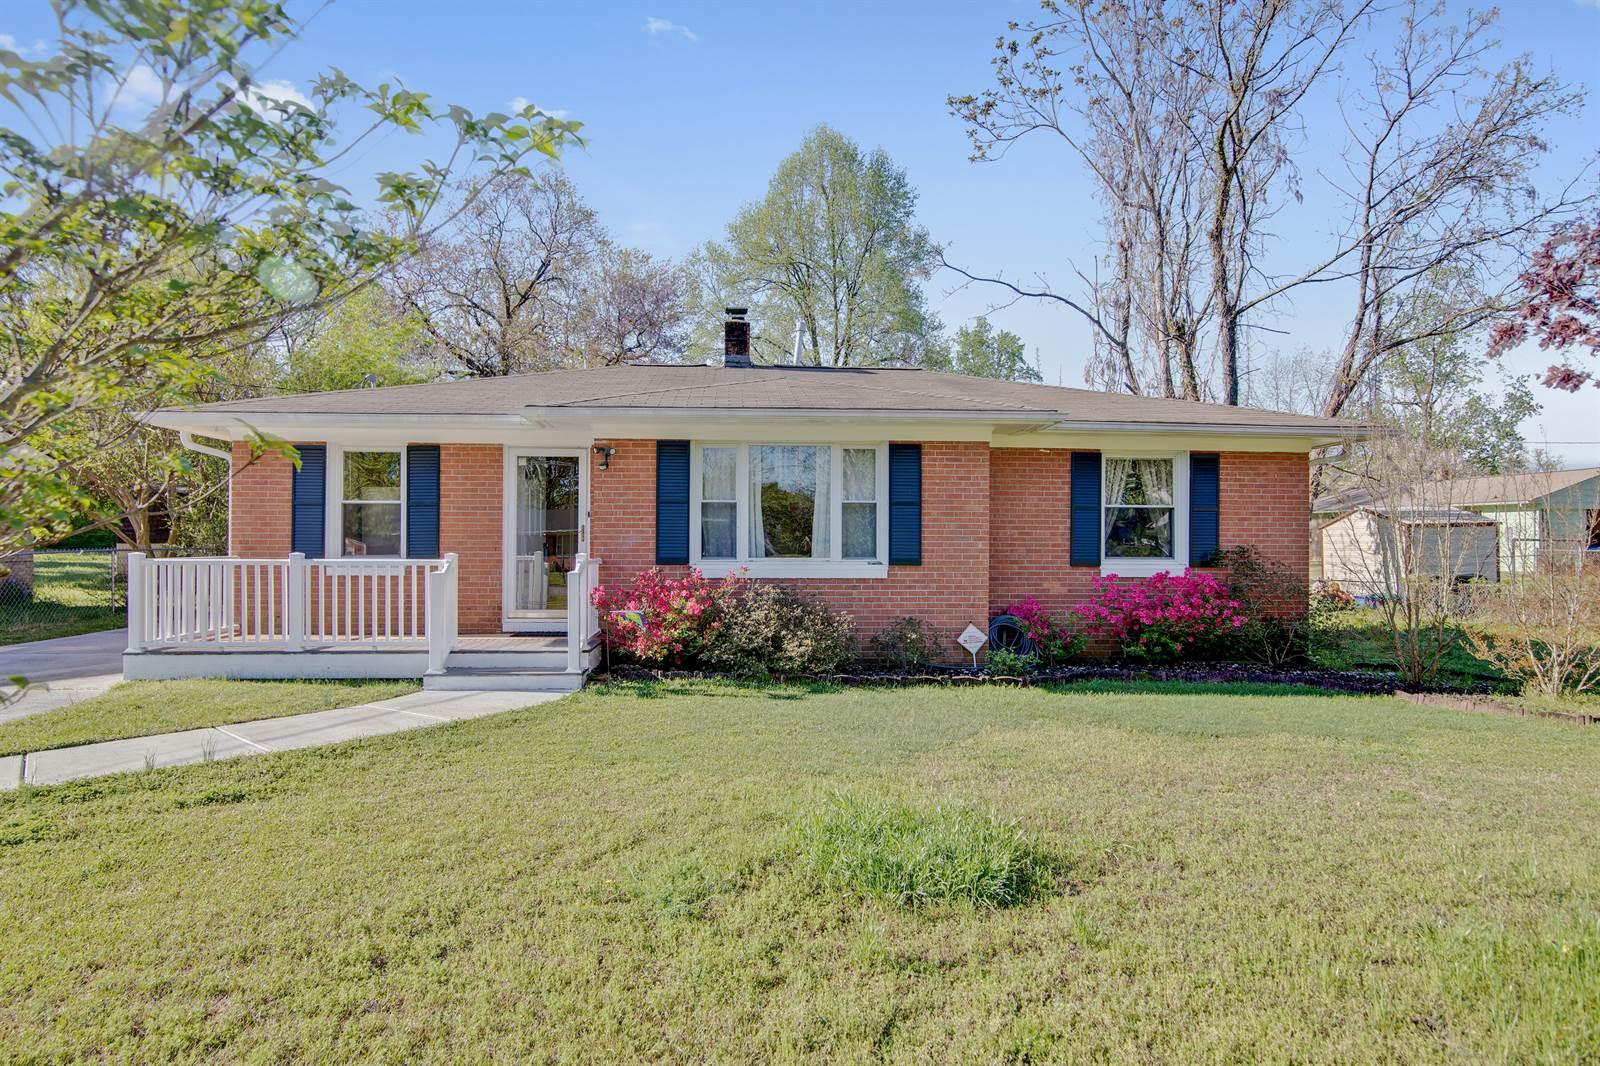 717 Tupelo Circle, Fayetteville, NC 28304